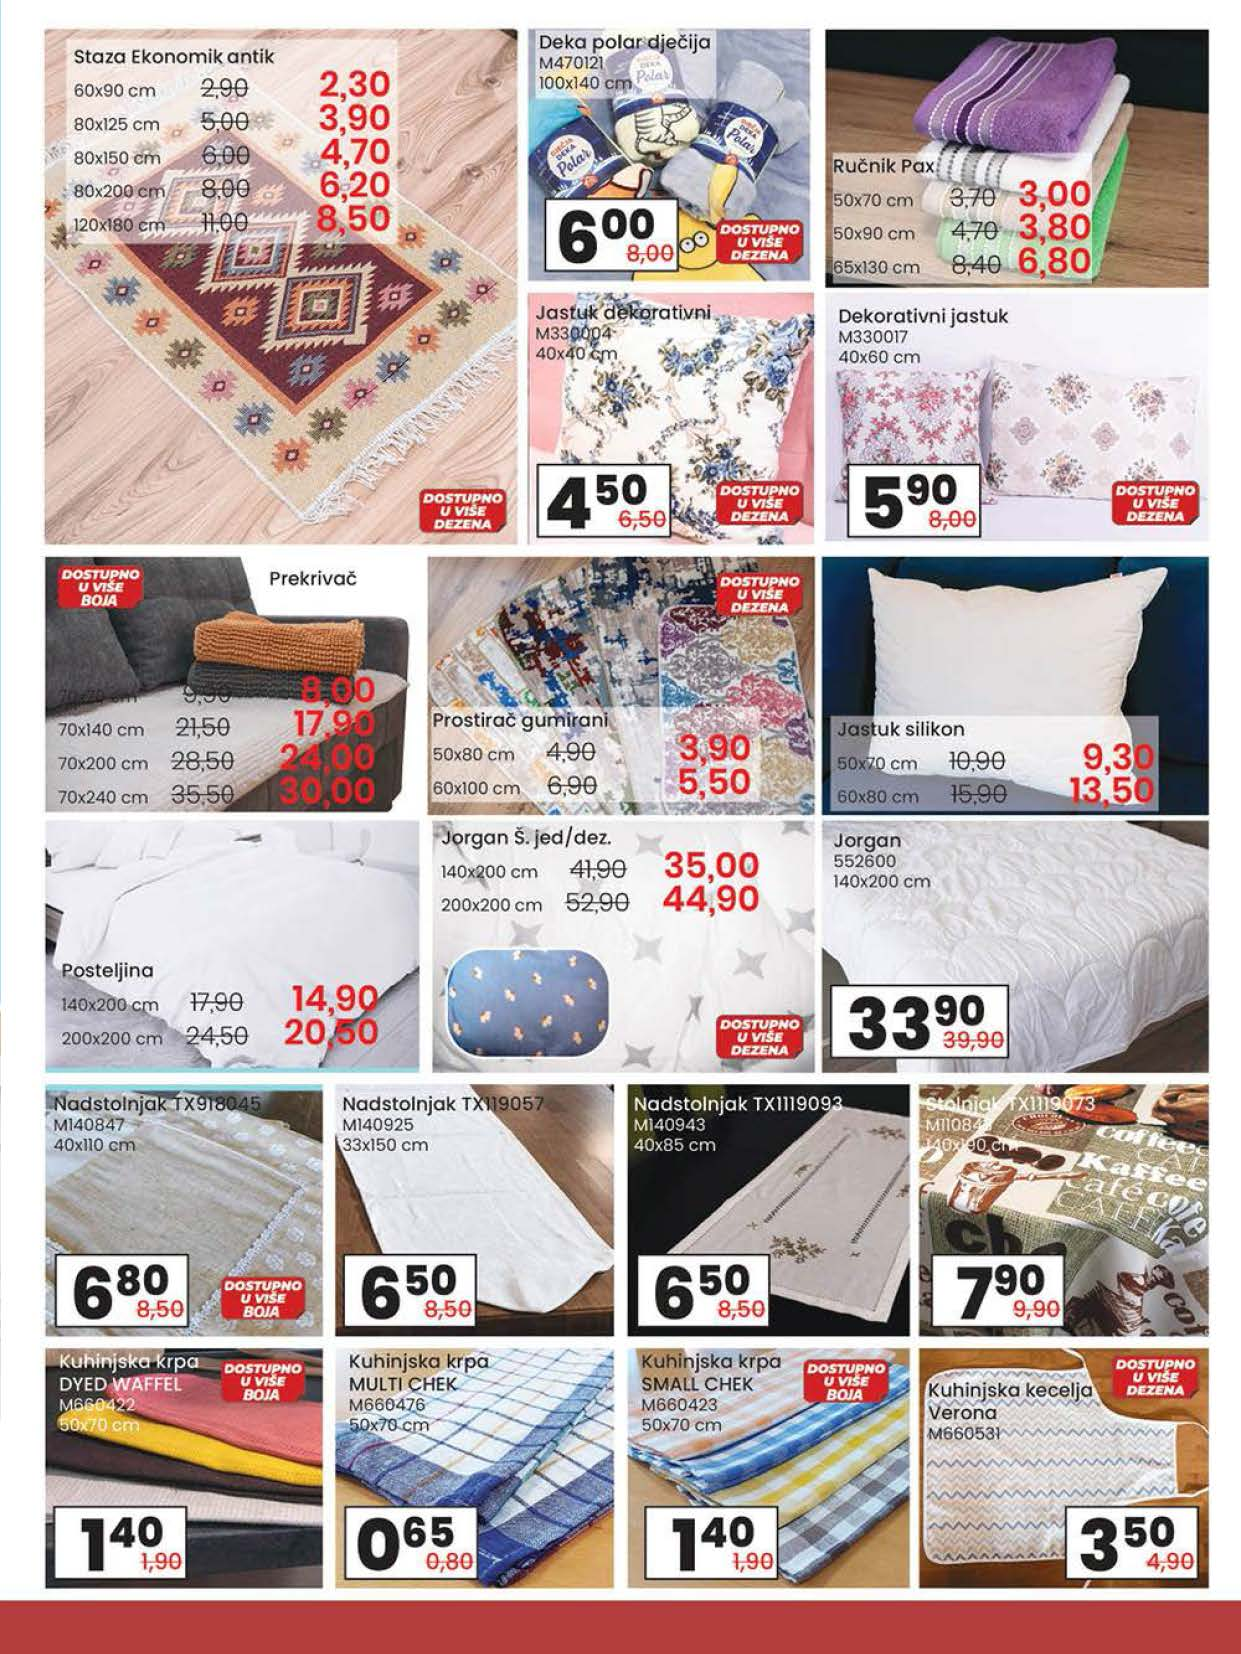 FISov Katalog Akcijski katalog APRIL i MAJ 2021 19.04.2021. 09.05.2021. Page 31